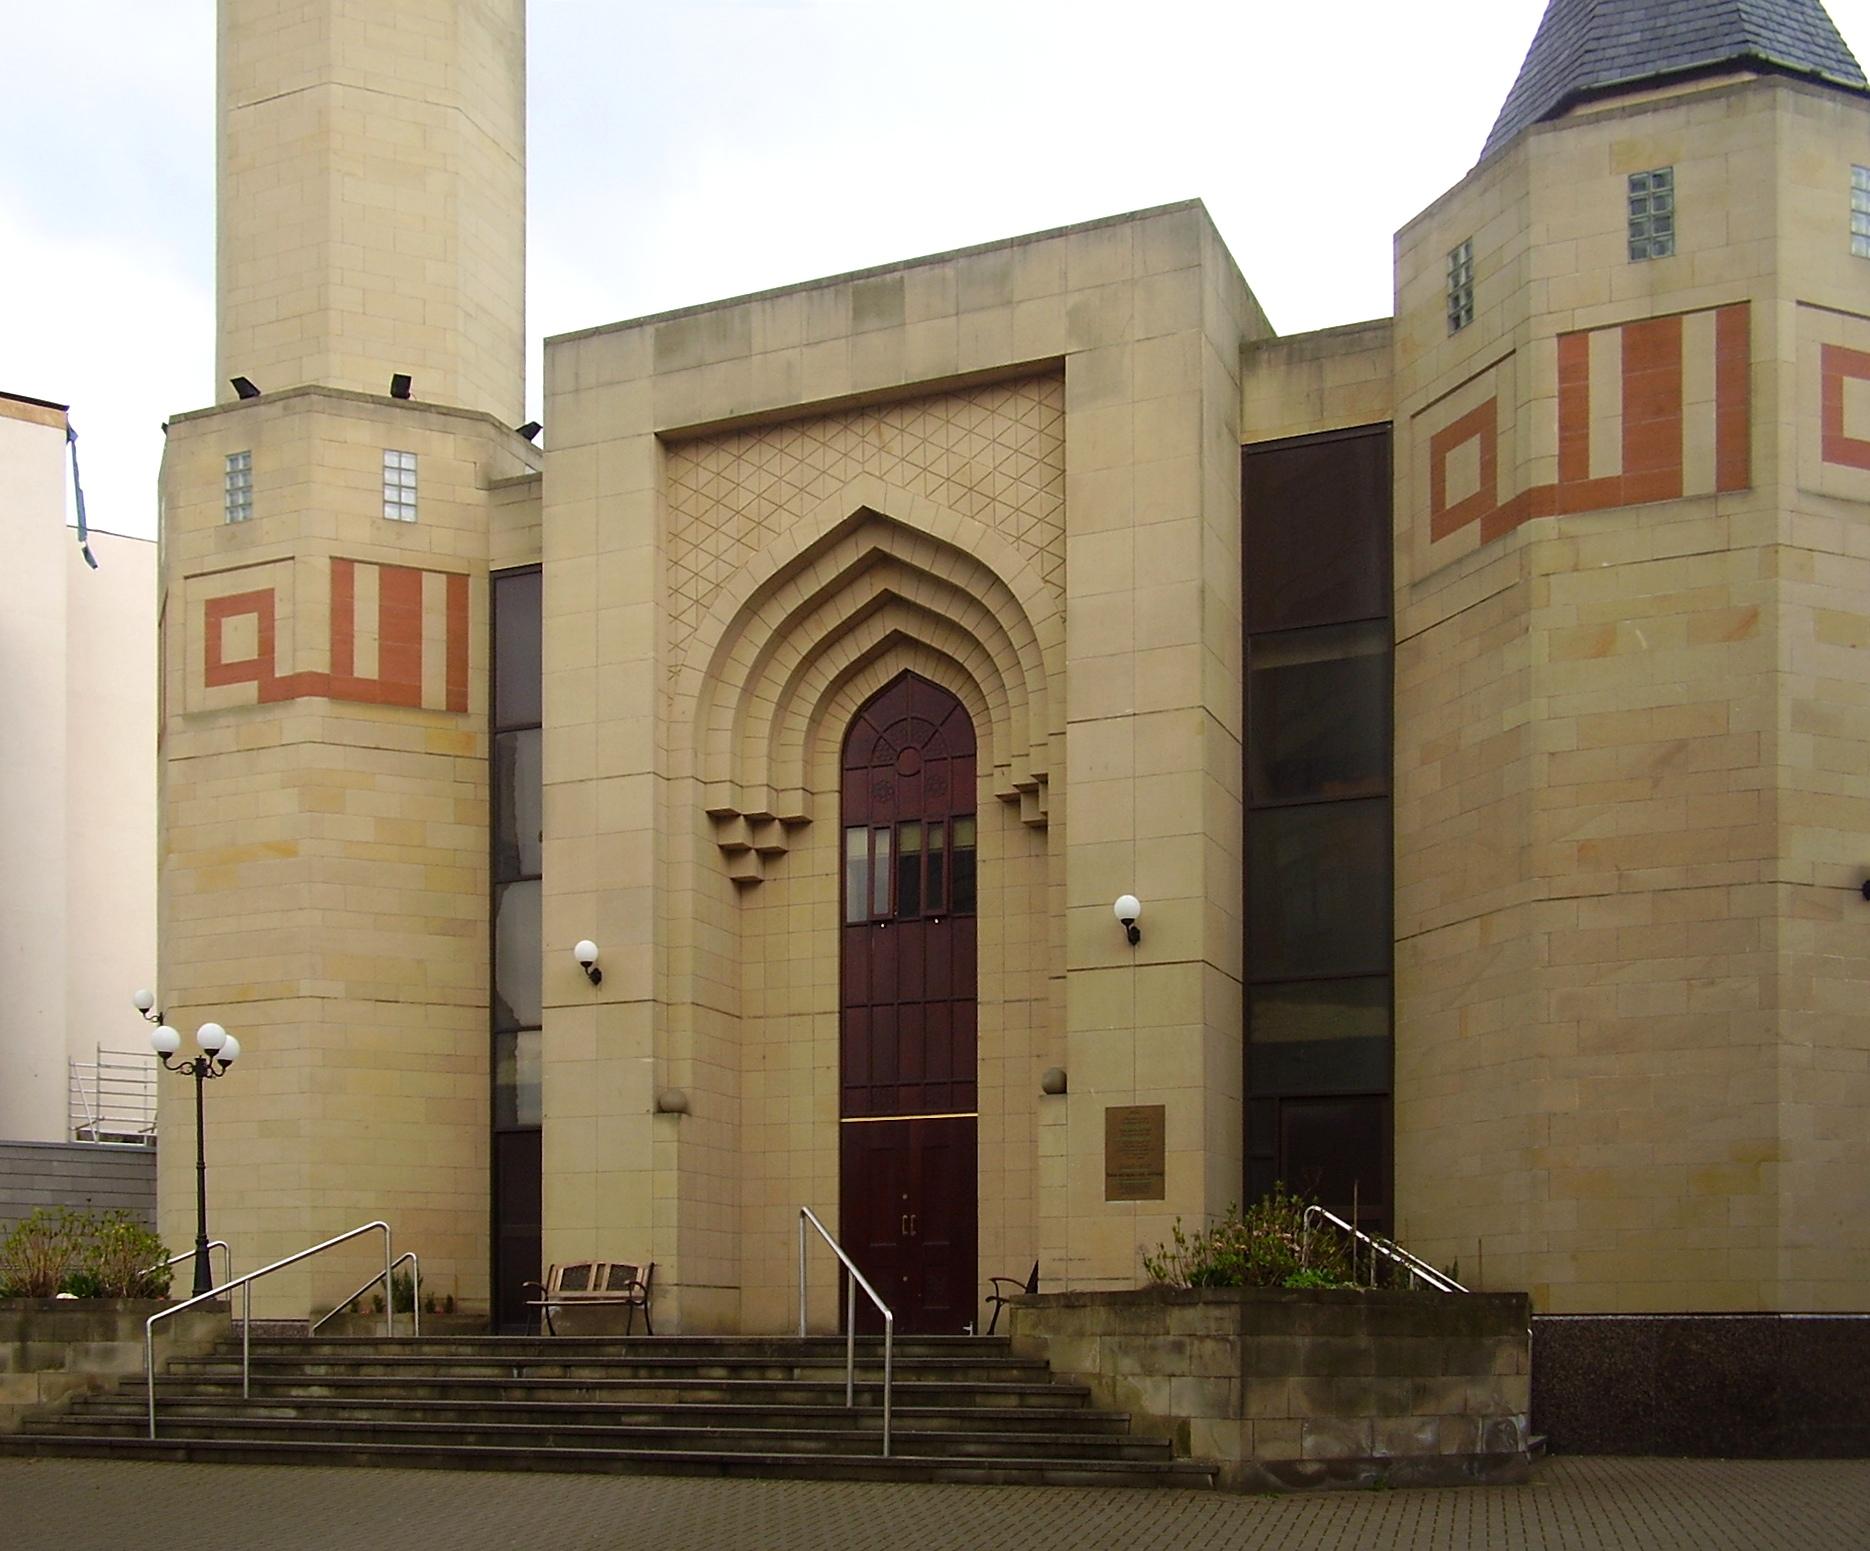 http://upload.wikimedia.org/wikipedia/commons/f/f7/Edinburgh_central_mosque_edit.jpg